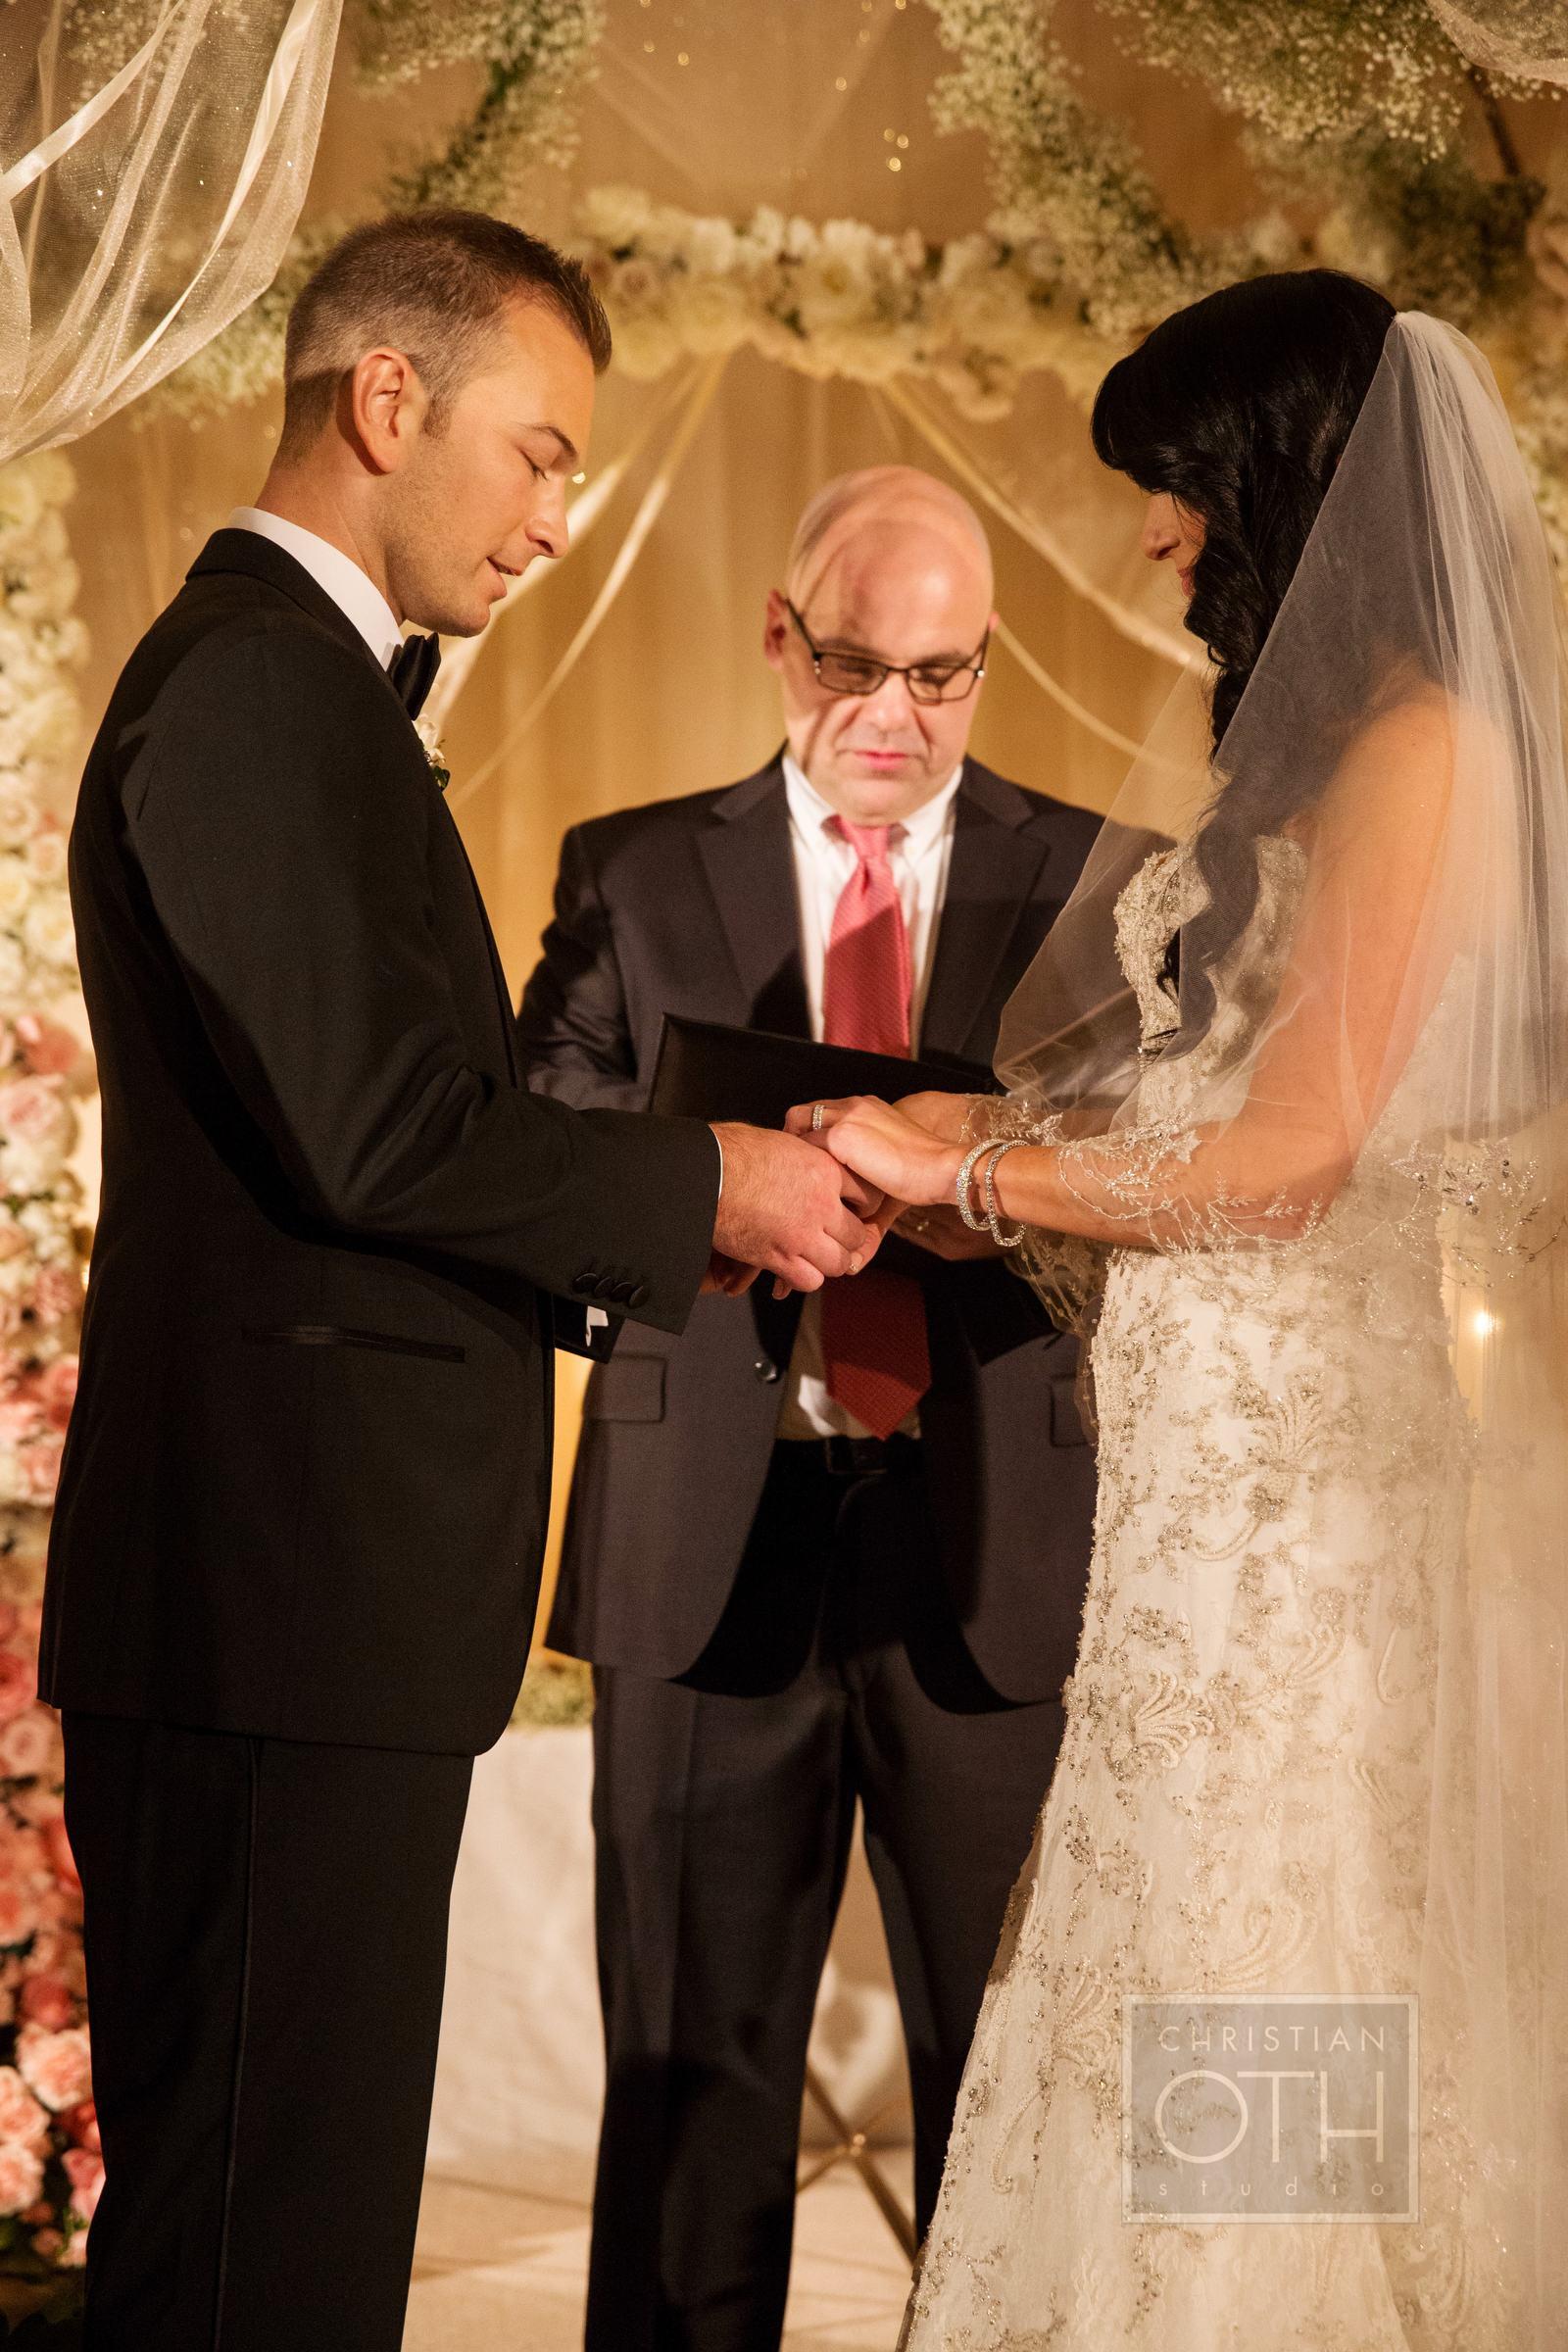 Ceci_New_York_Custom_Invitation_Pierre__City_ Destination_Wedding_Luxury_Personalized_Ceci_Style_Bride_Rose_Gold_Foil_Stamping107.JPG